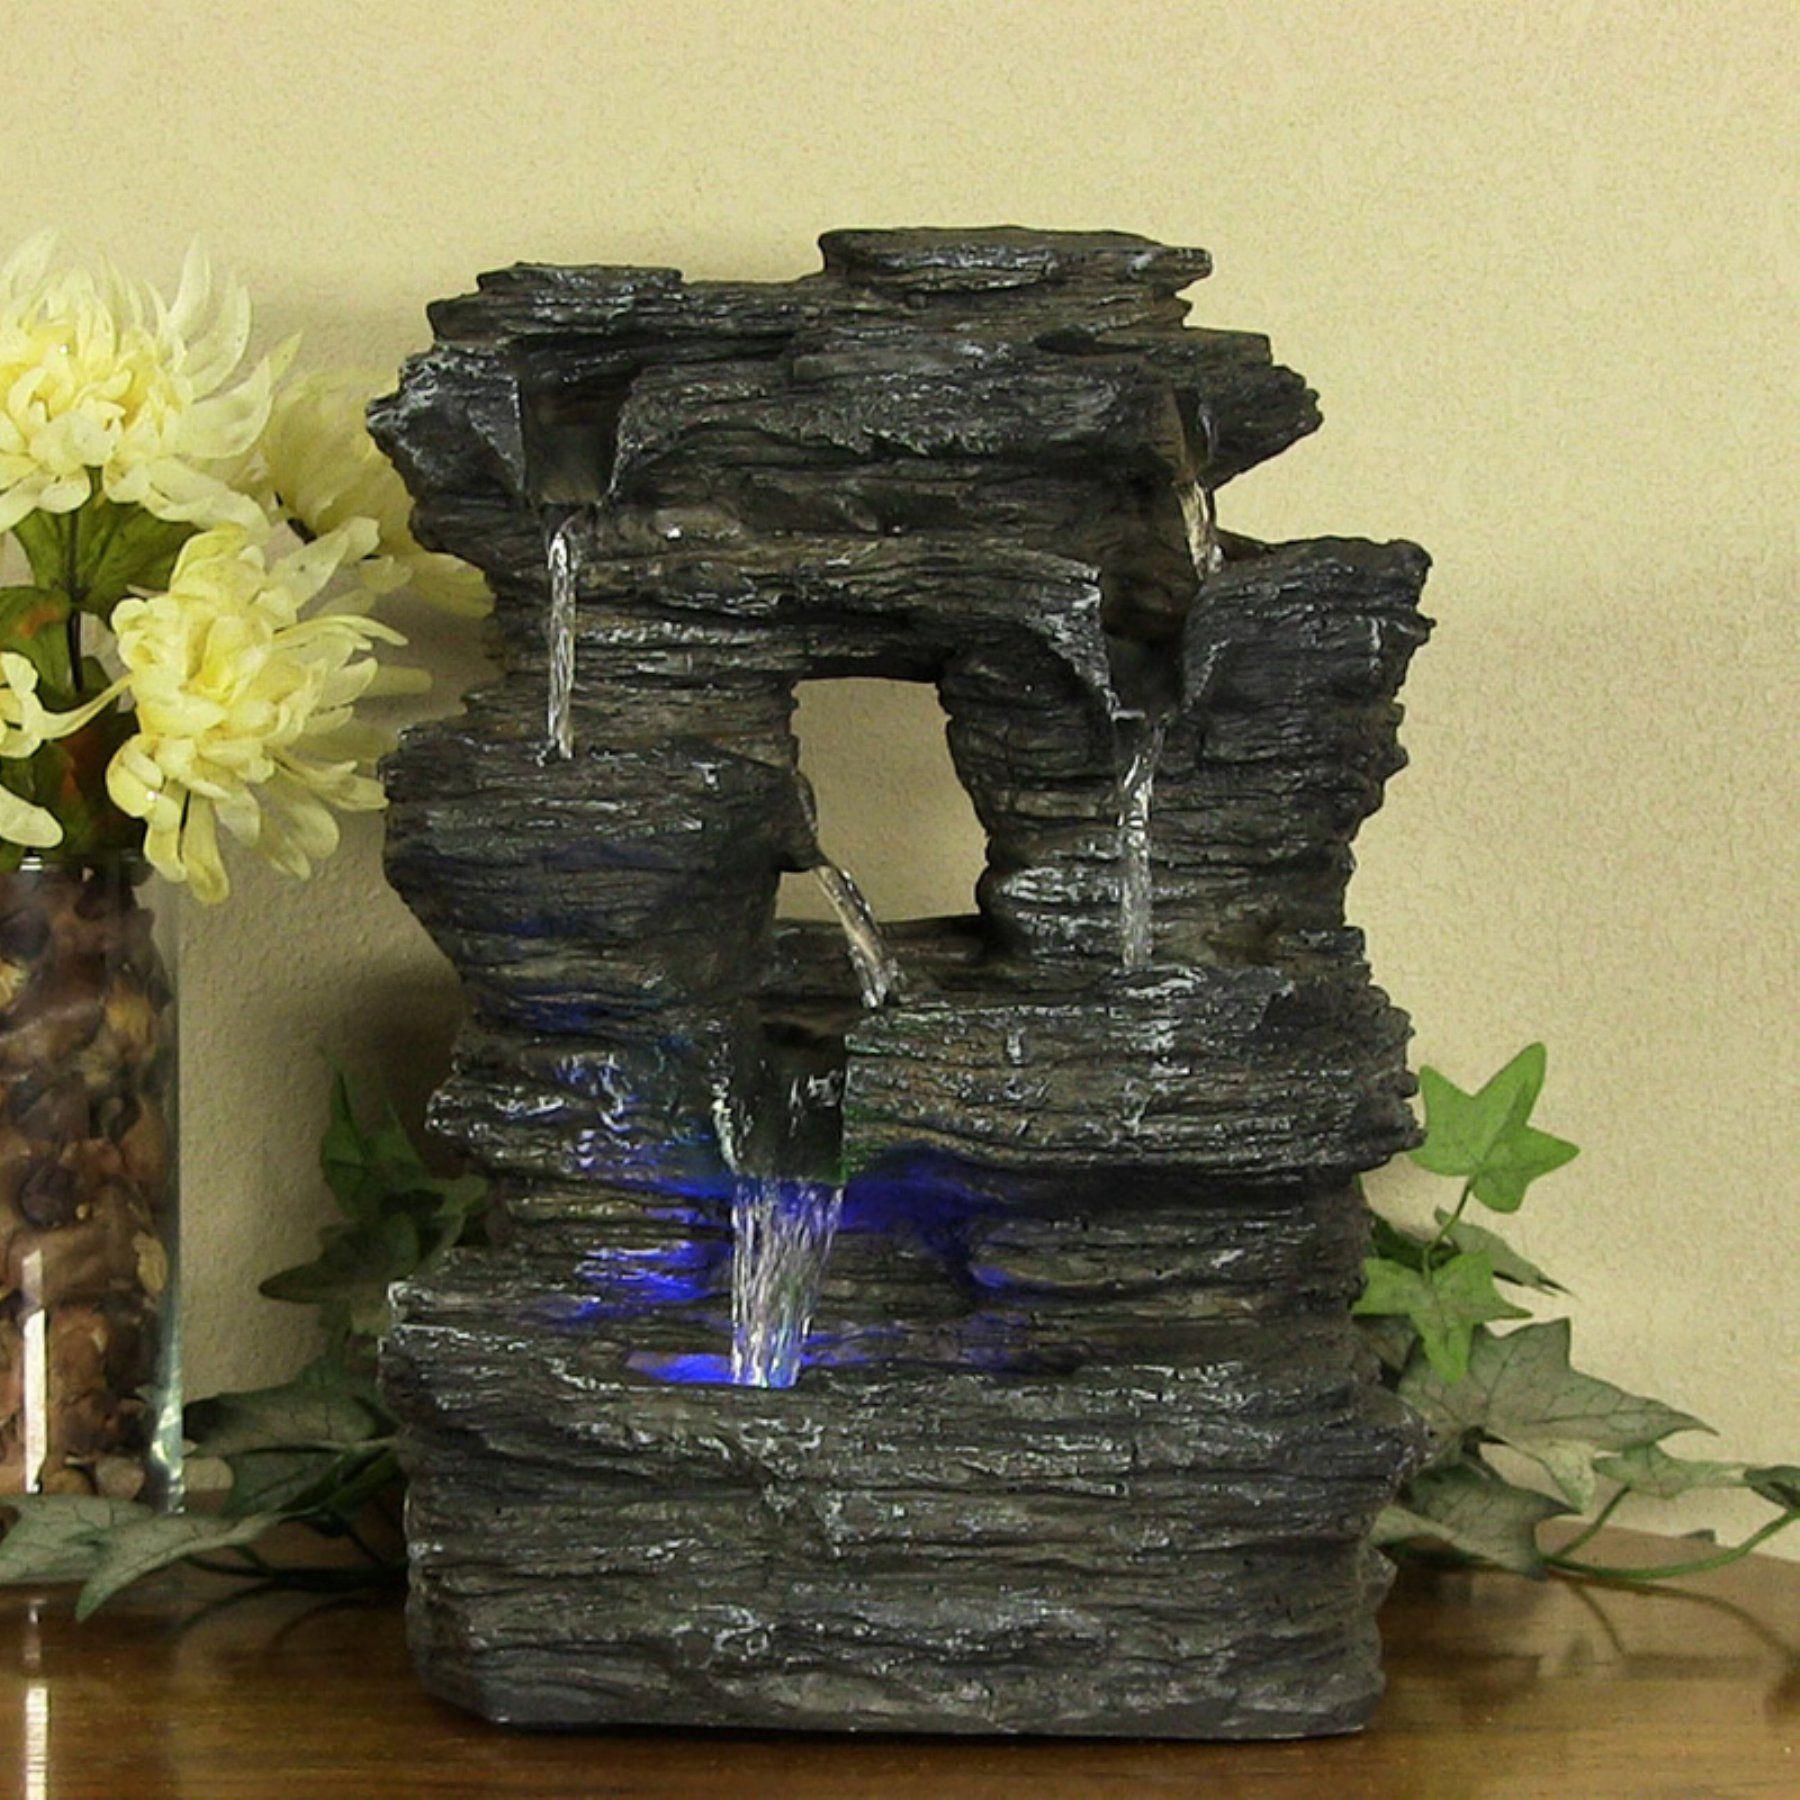 Sunnydaze Decor Five Stream Rock Cavern Tabletop Fountain With LED Light    DW 47111